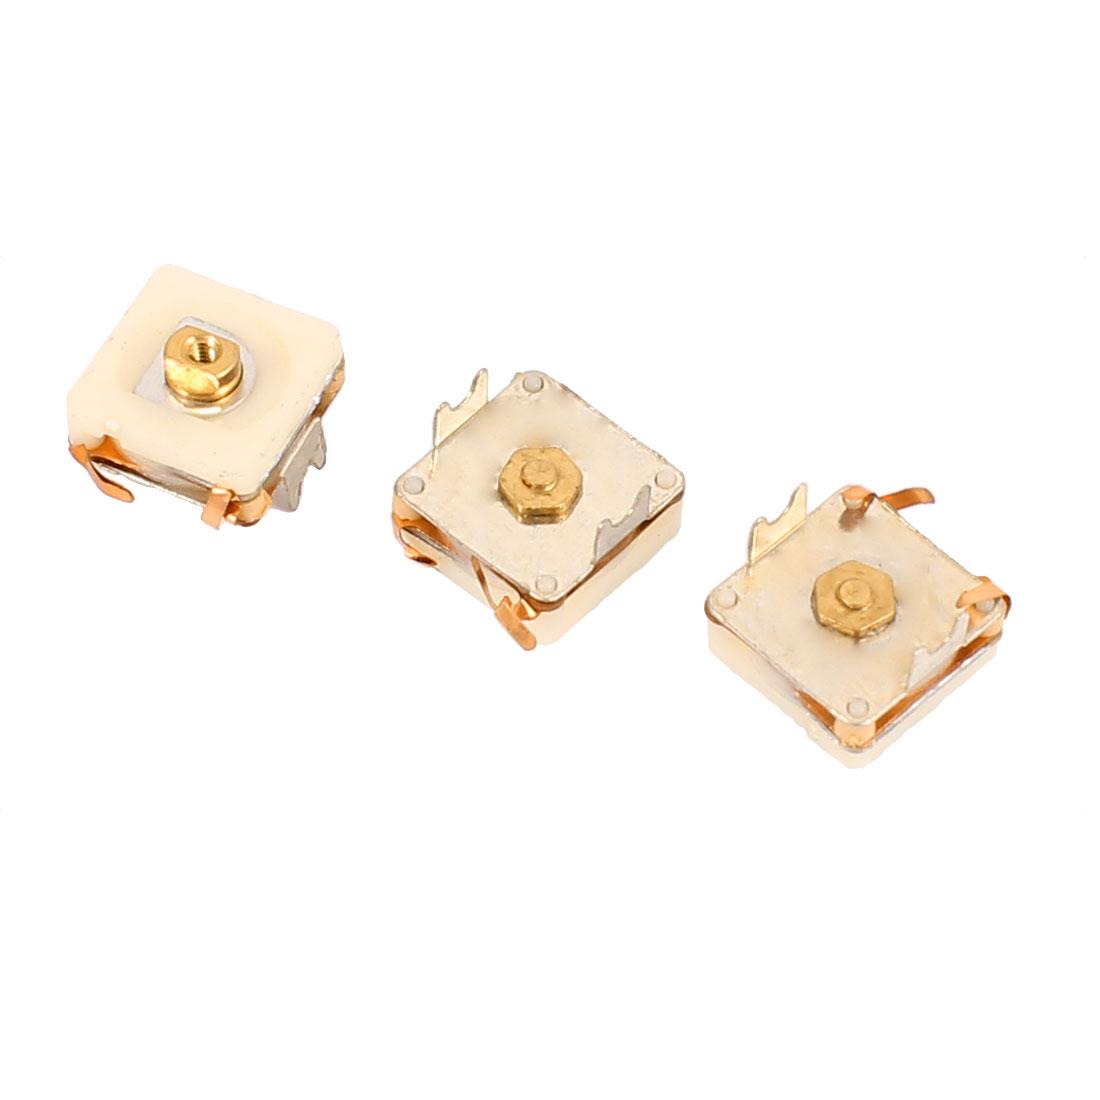 3pcs PVC-206 206pF Medium Variodencer PCB Trimmer Tuning Variable Adjustable Capacitors for Radio